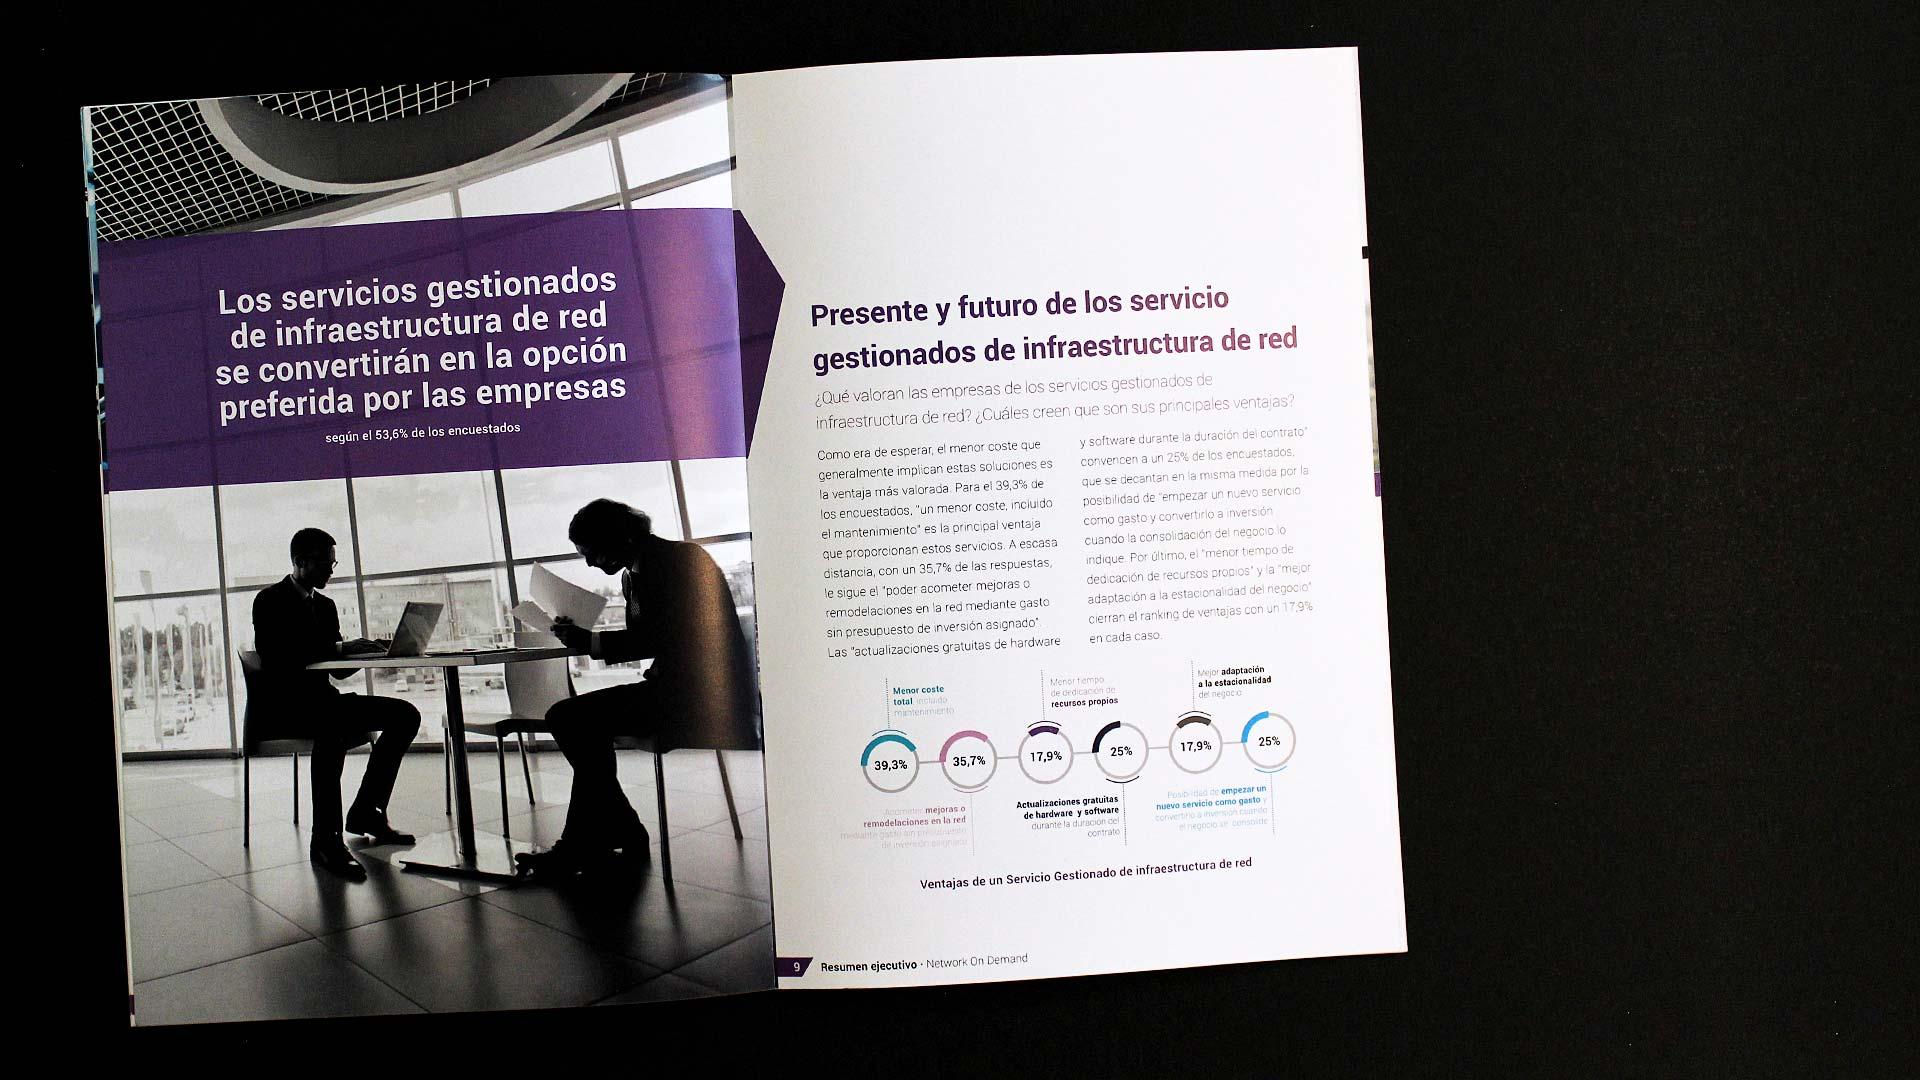 alcatel-content-marketing-informe-resumen-ejecutivo-networkondemand-ebook-2016-06